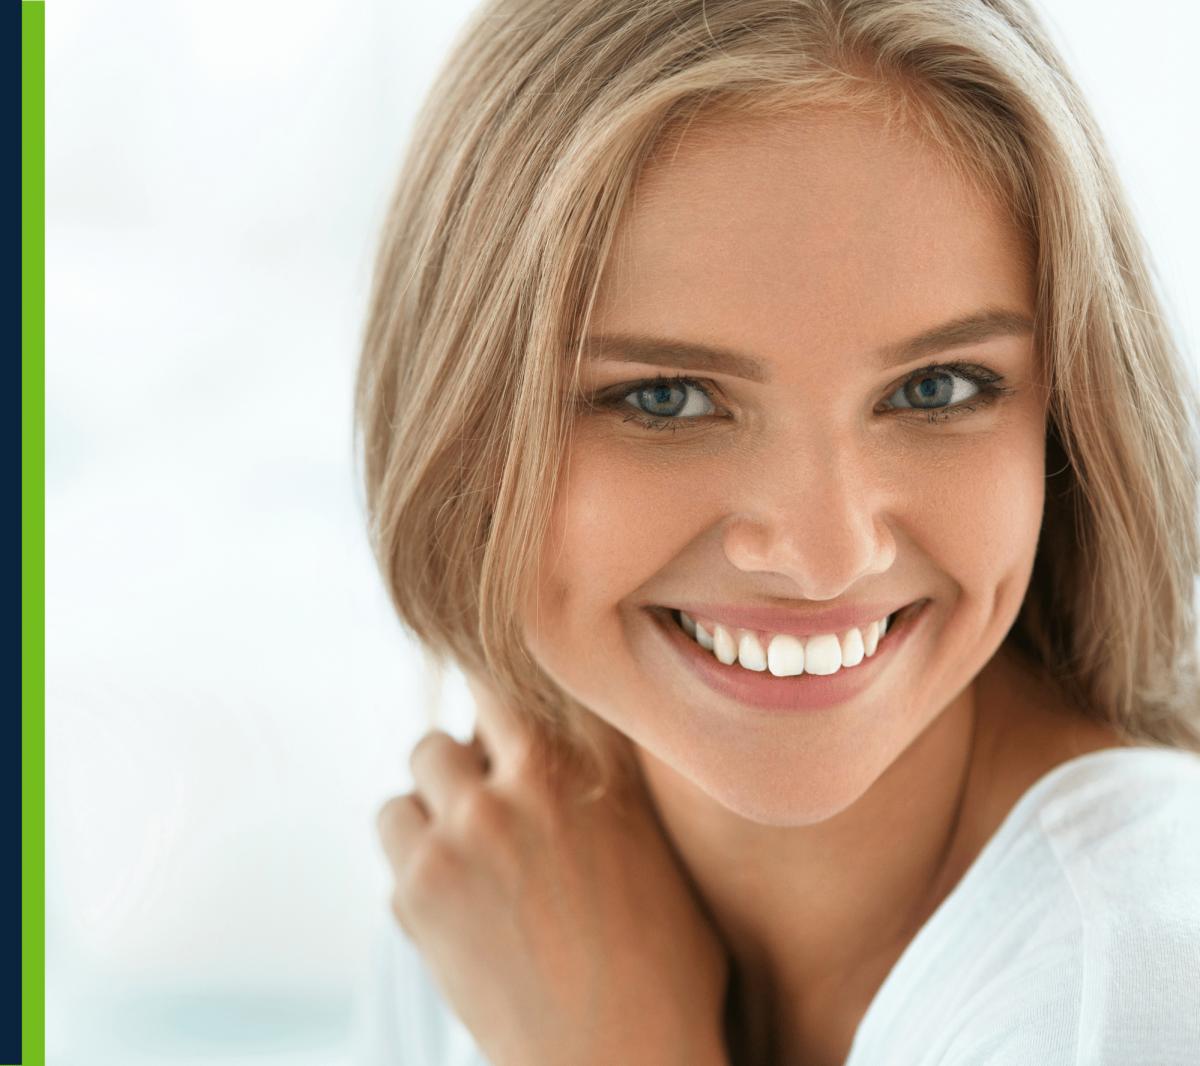 Genómica aplicada a la salud dental-Eugenomic